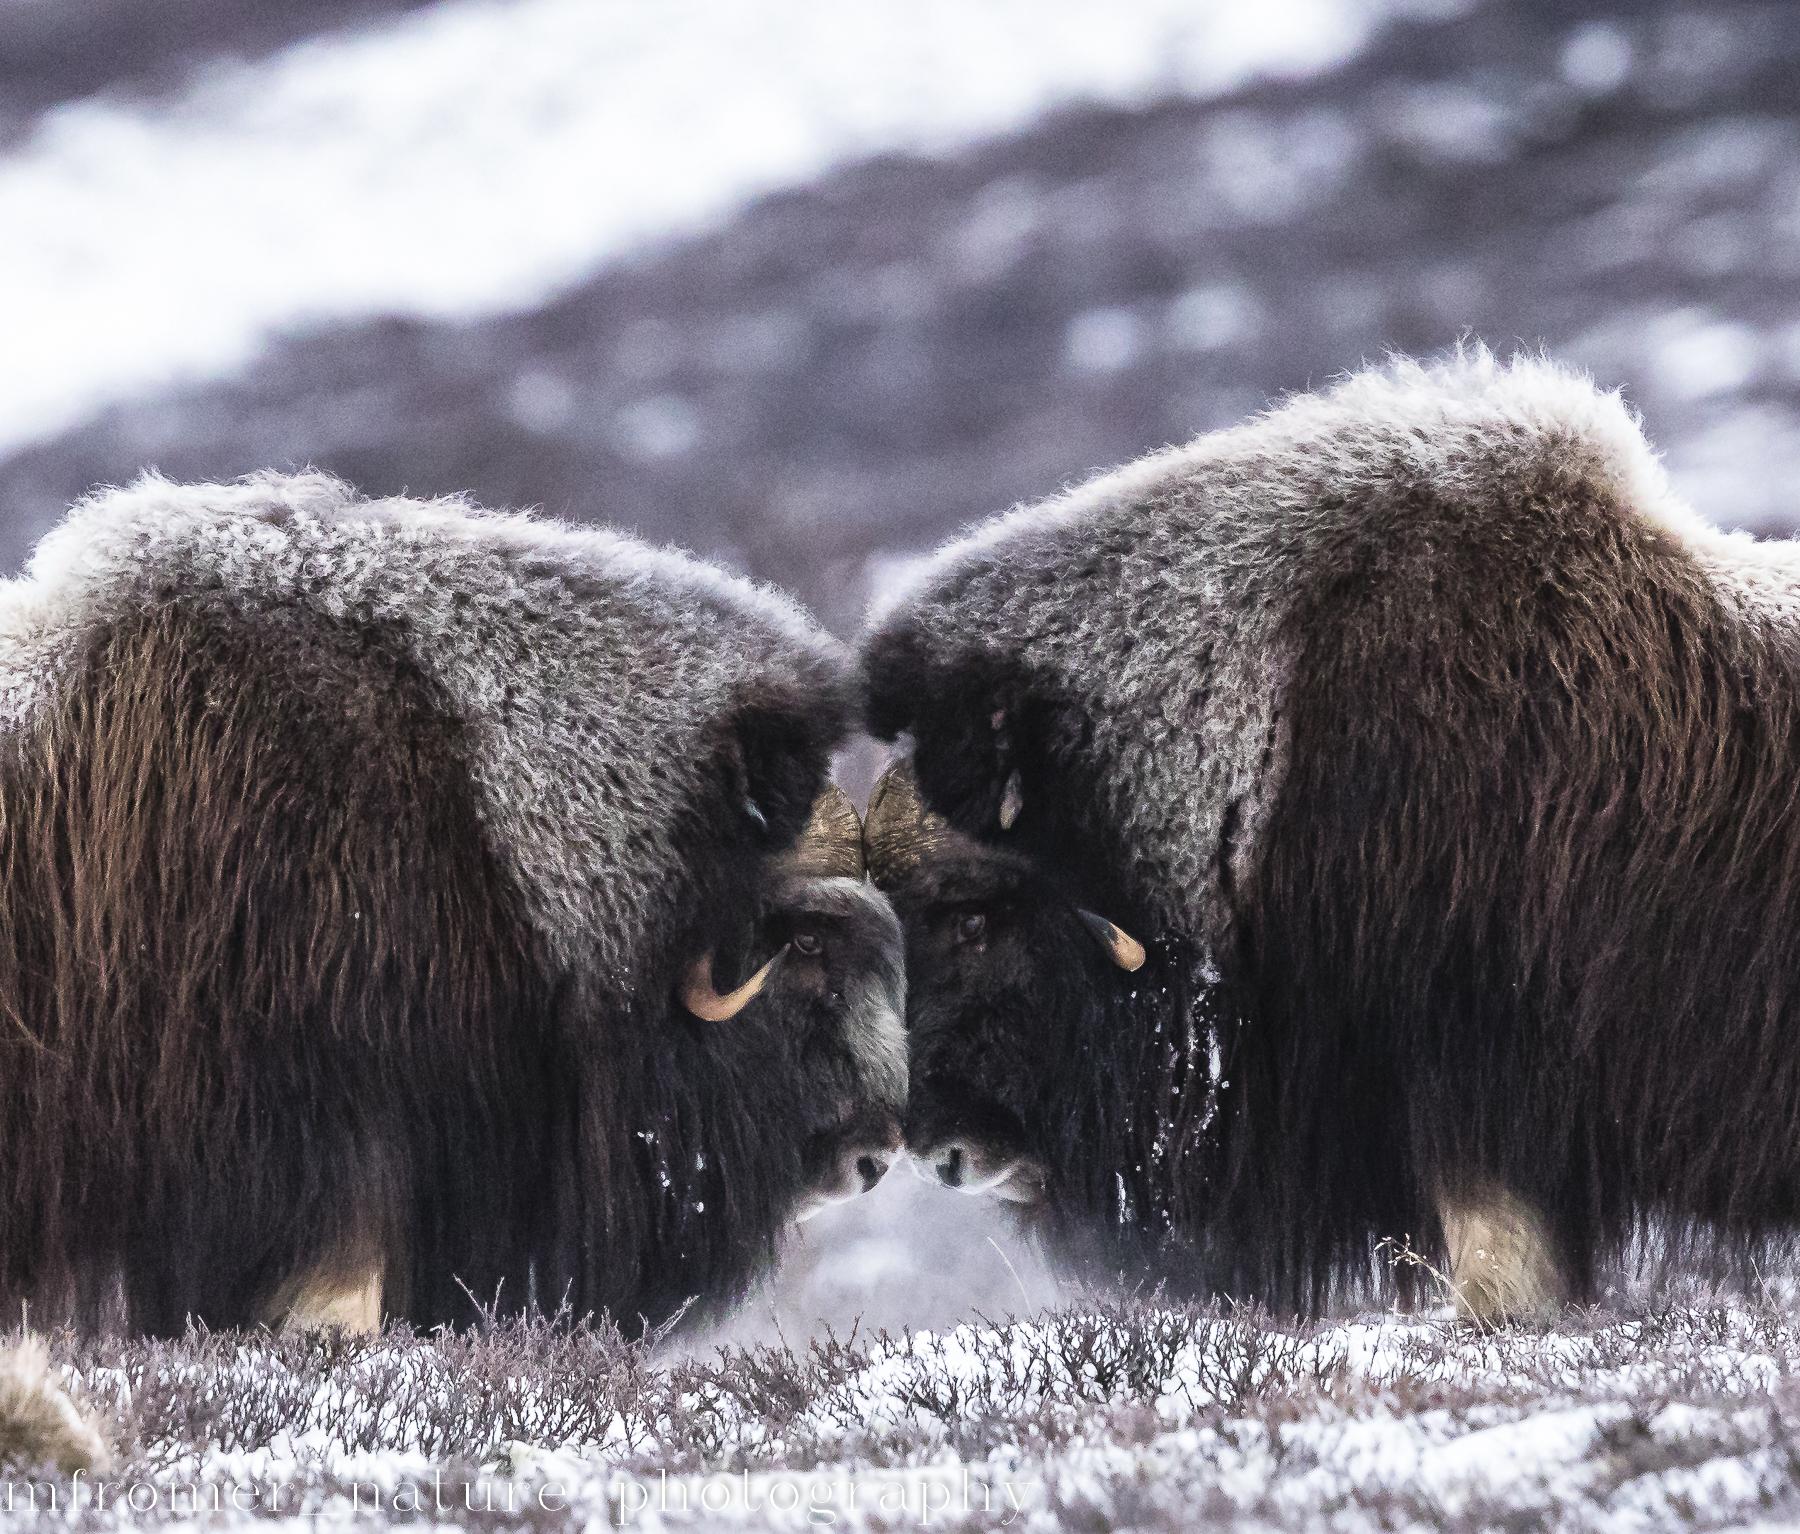 2 bulls head to head